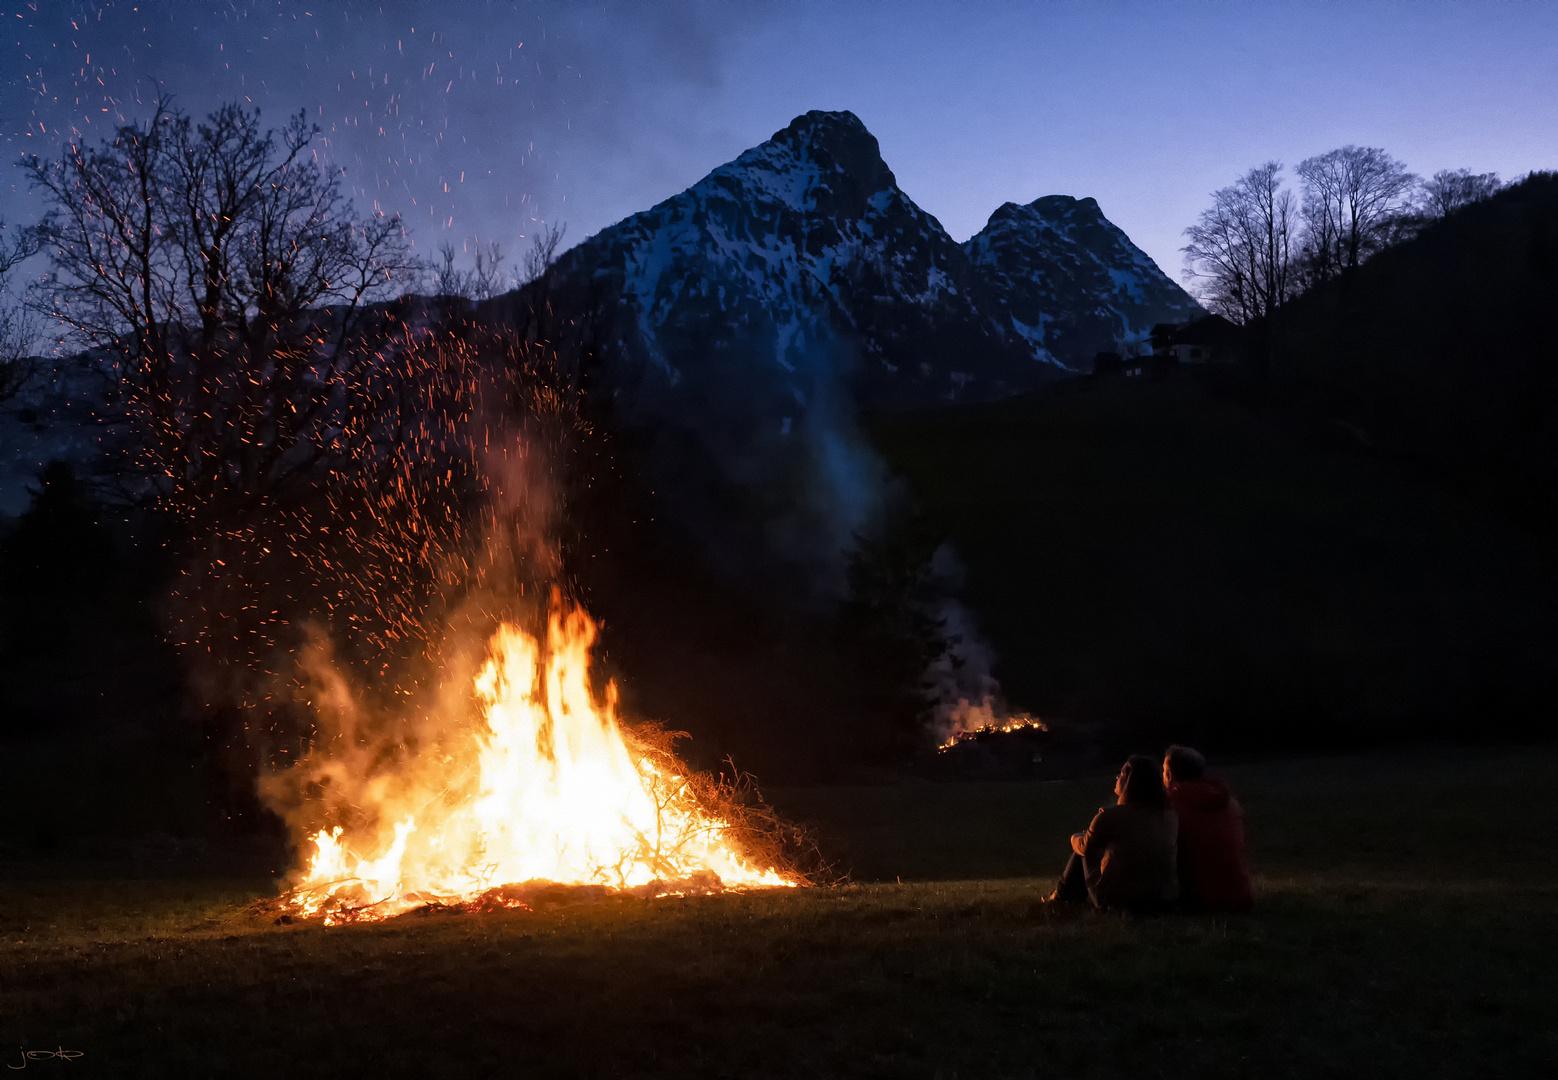 Osterfeuer - Licht des Lebens